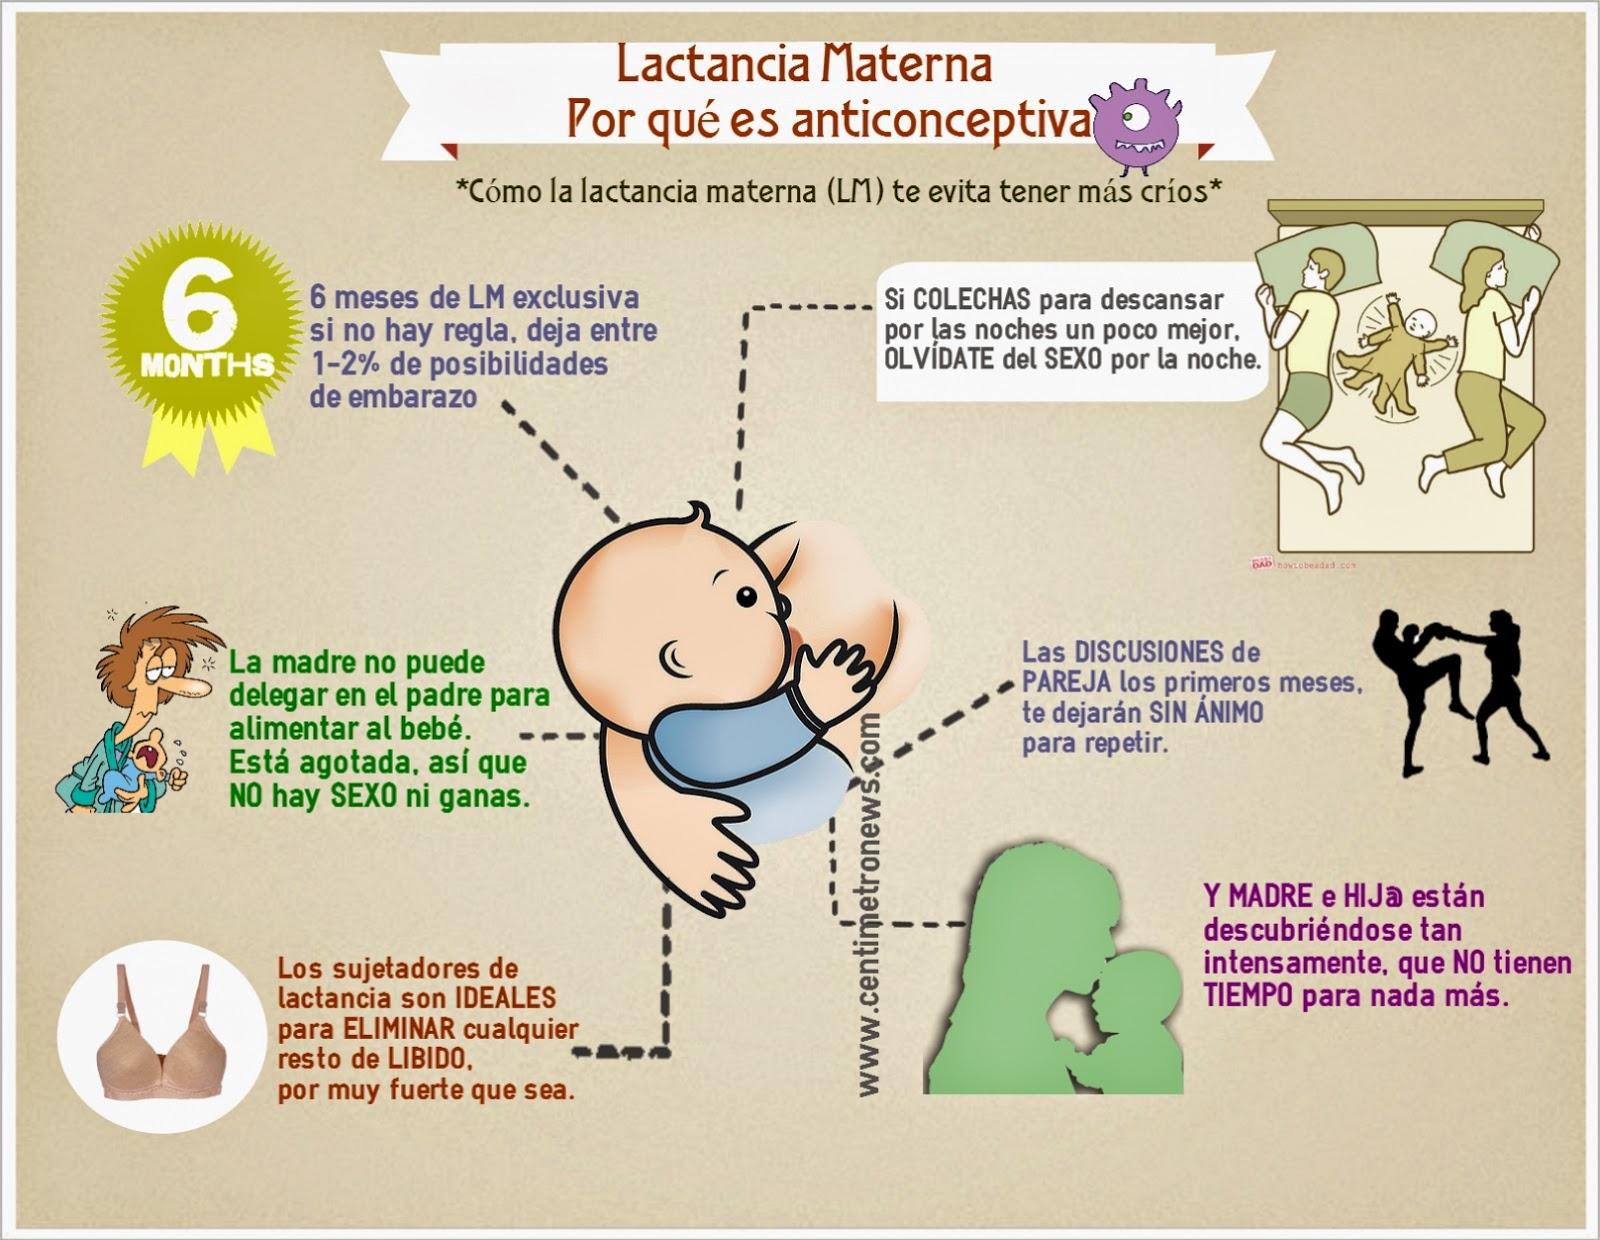 lactancia materna es anticonceptiva infografia